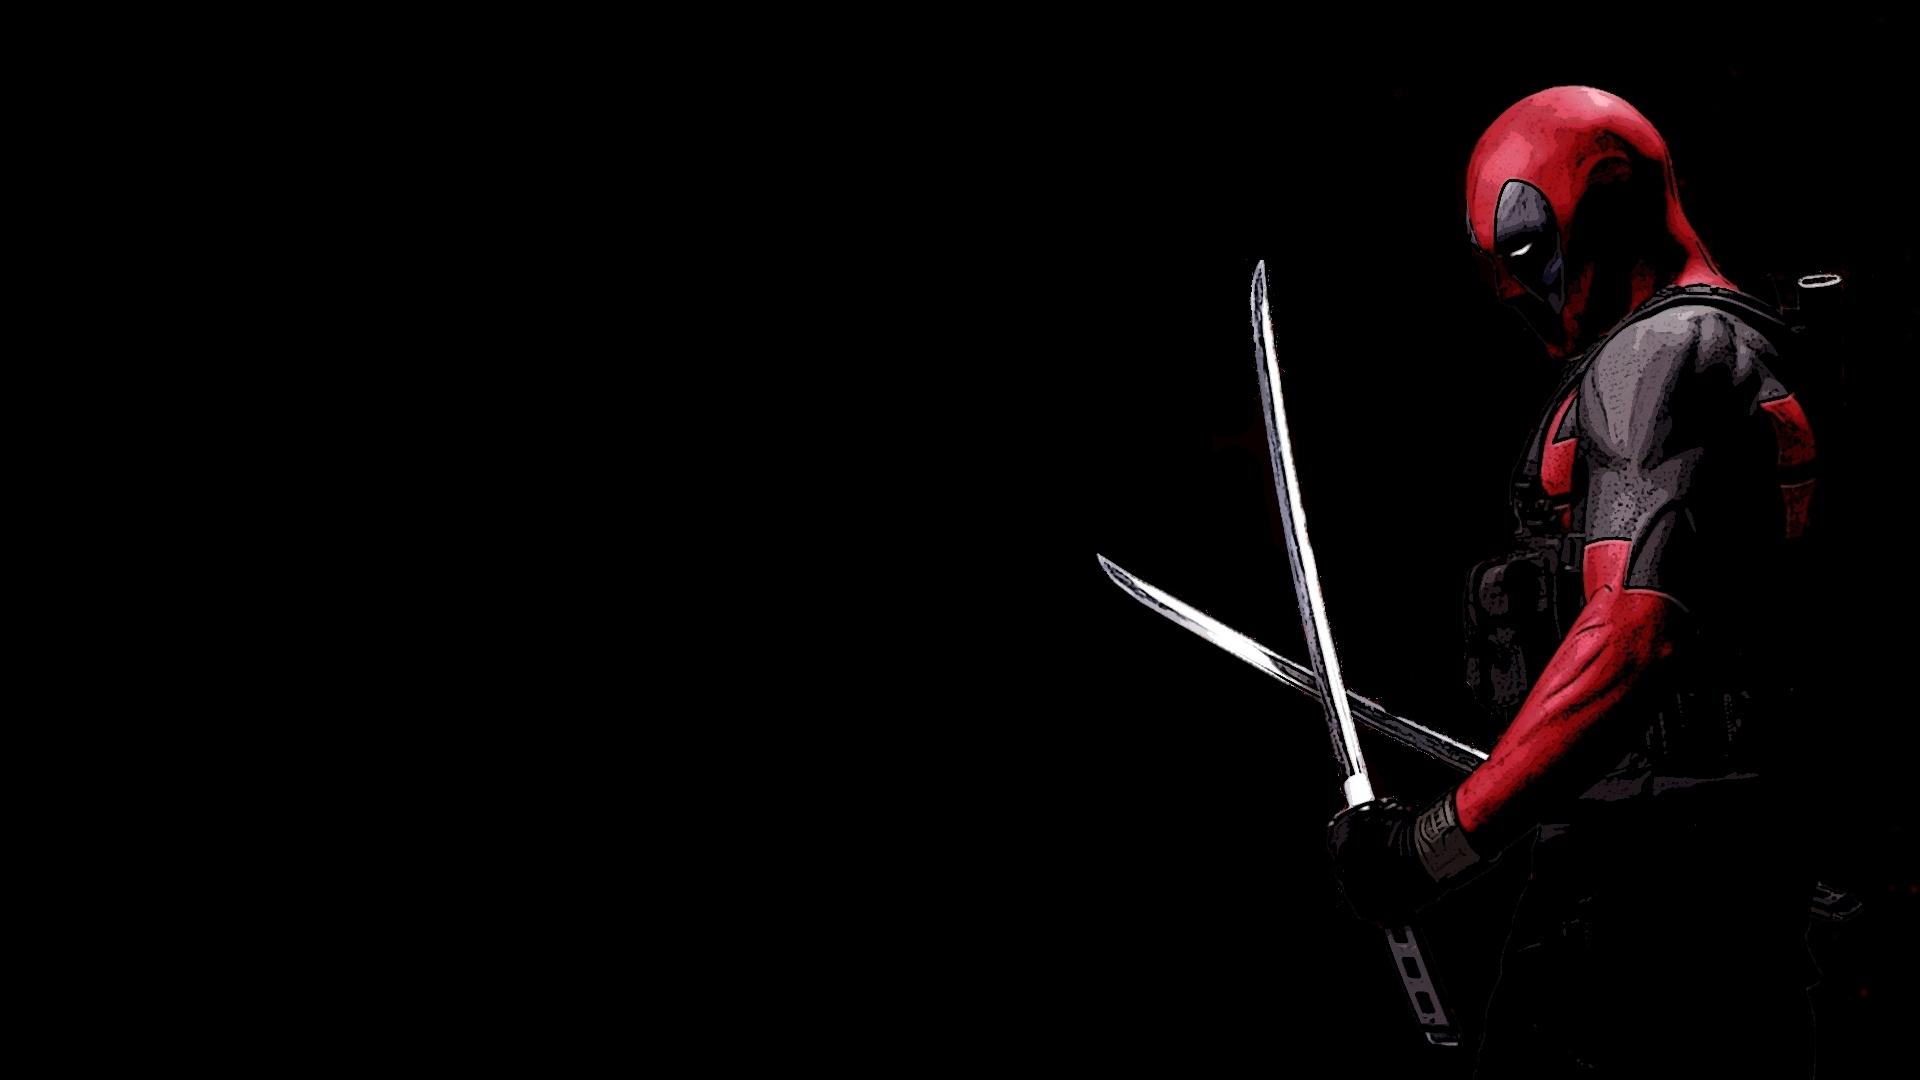 Wade Winston Deadpool Marvel Comics Wallpaper HD 1920x1080